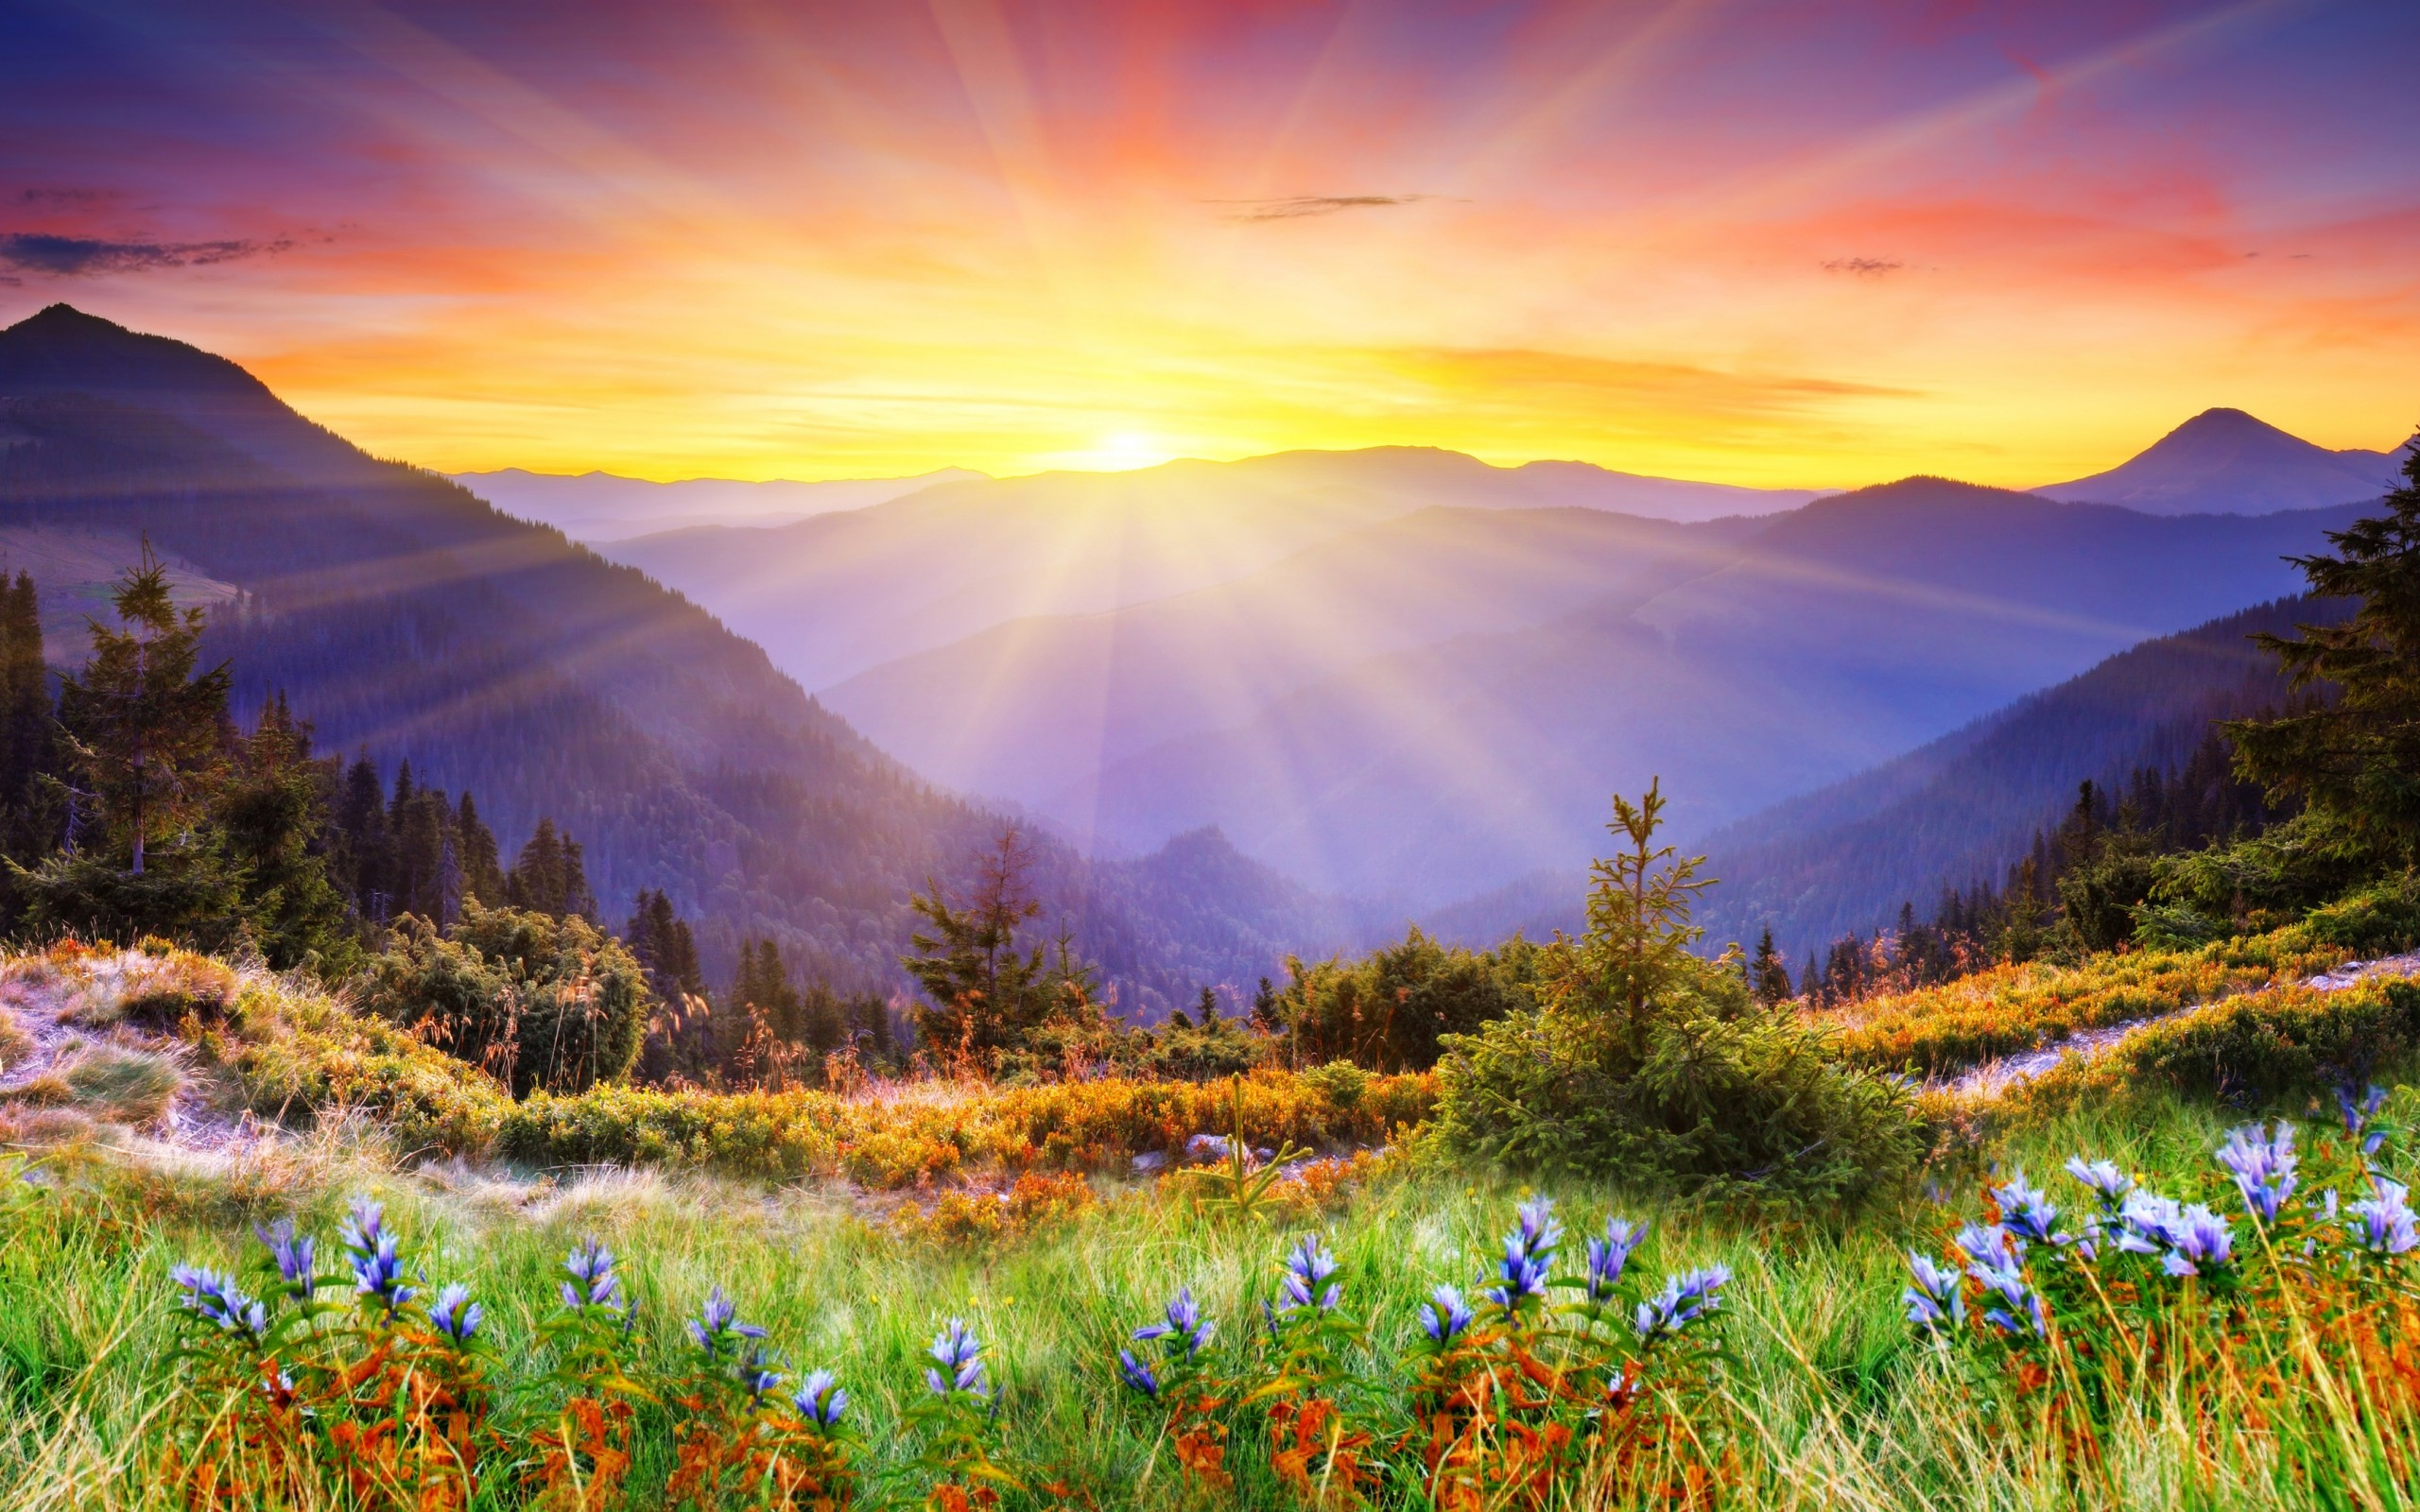 Magical Landscape 4K Ultra HD wallpaper 4k WallpaperNet 2560x1600